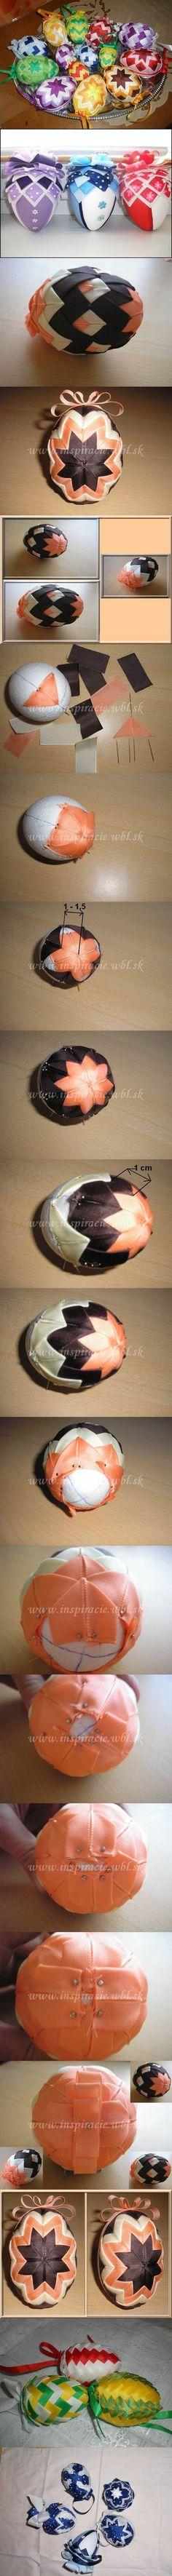 DIY Patchwork Decorated Easter Eggs | iCreativeIdeas.com Follow Us on Facebook --> https://www.facebook.com/icreativeideas